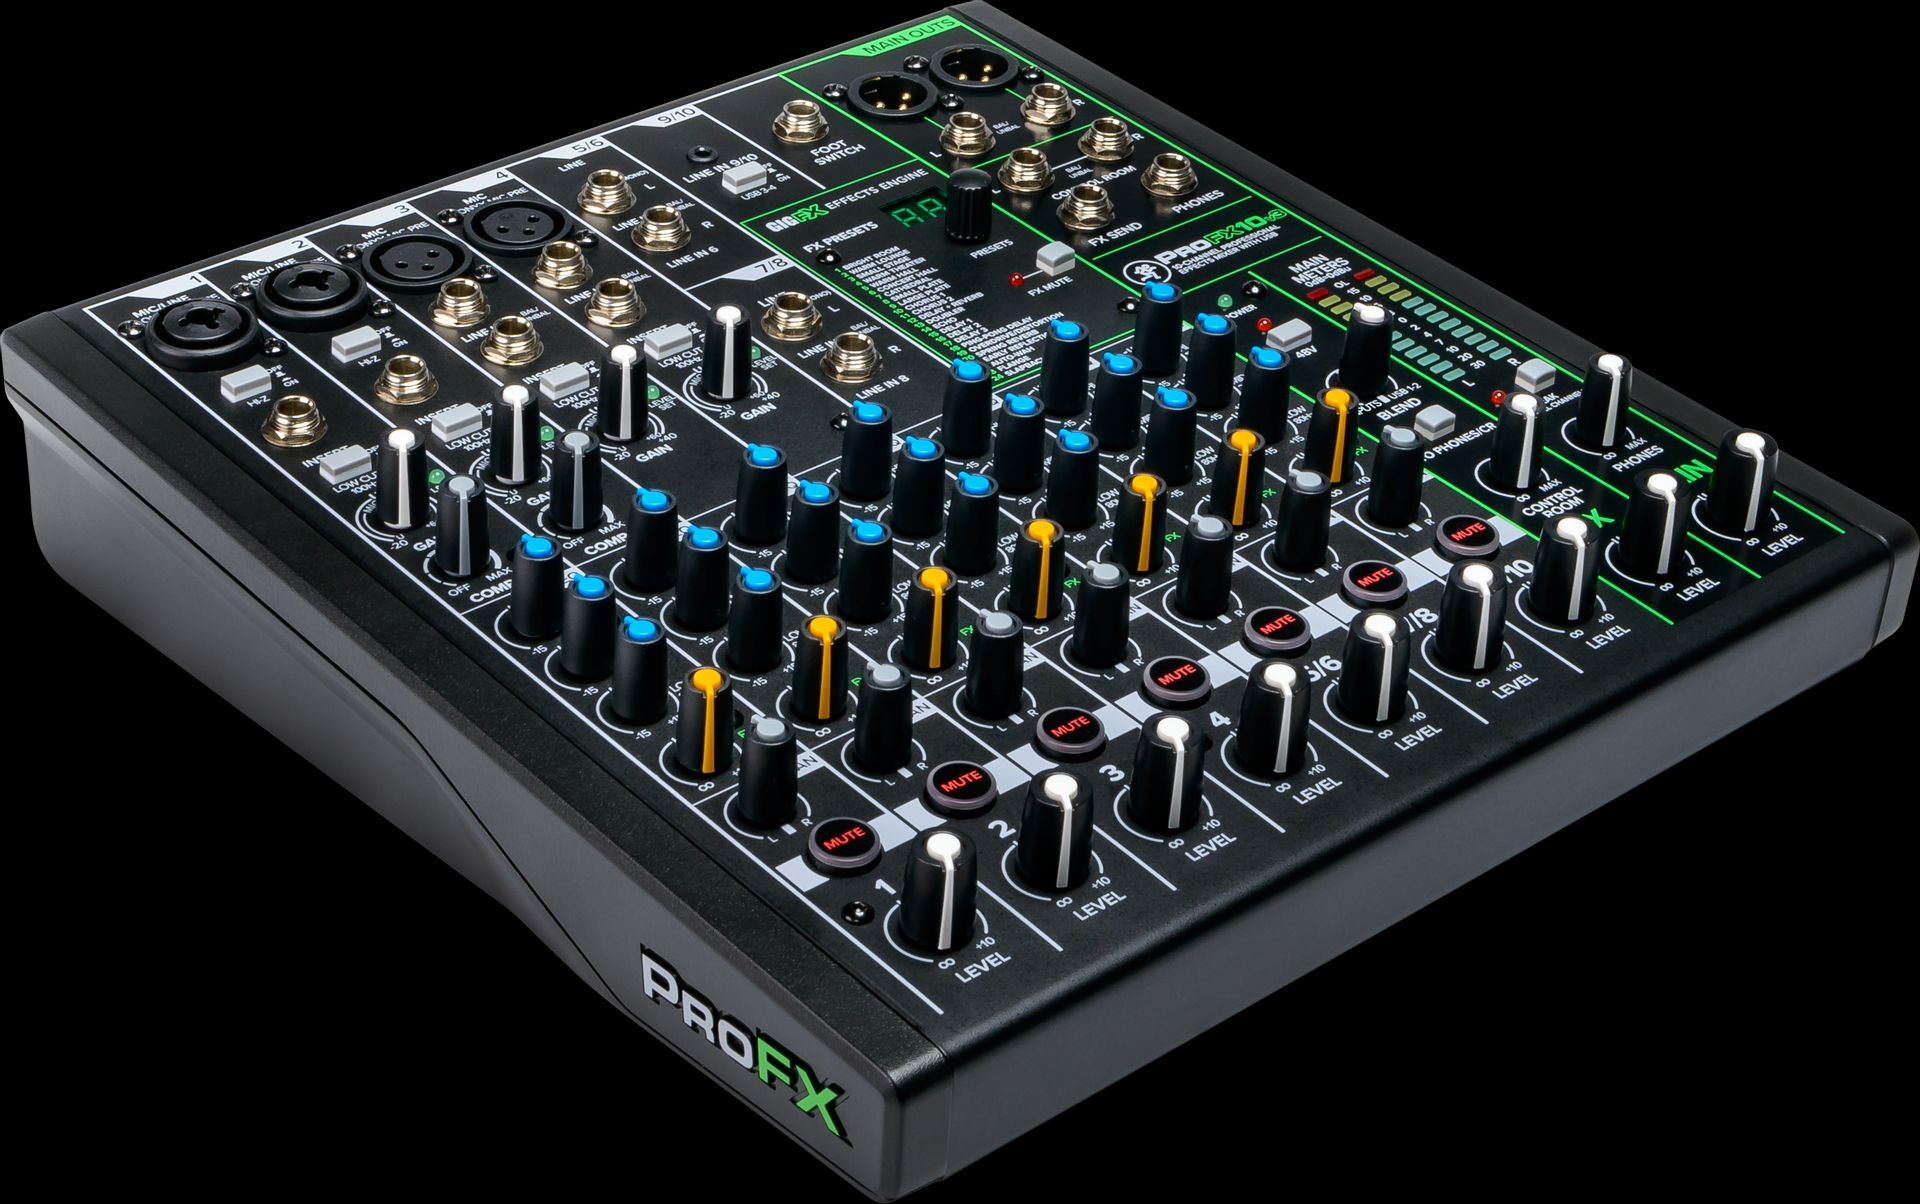 Mackie ProFX10v3 Mischpult 10-Kanal Mixer inkl. Effektgerät, USB-Anschluss